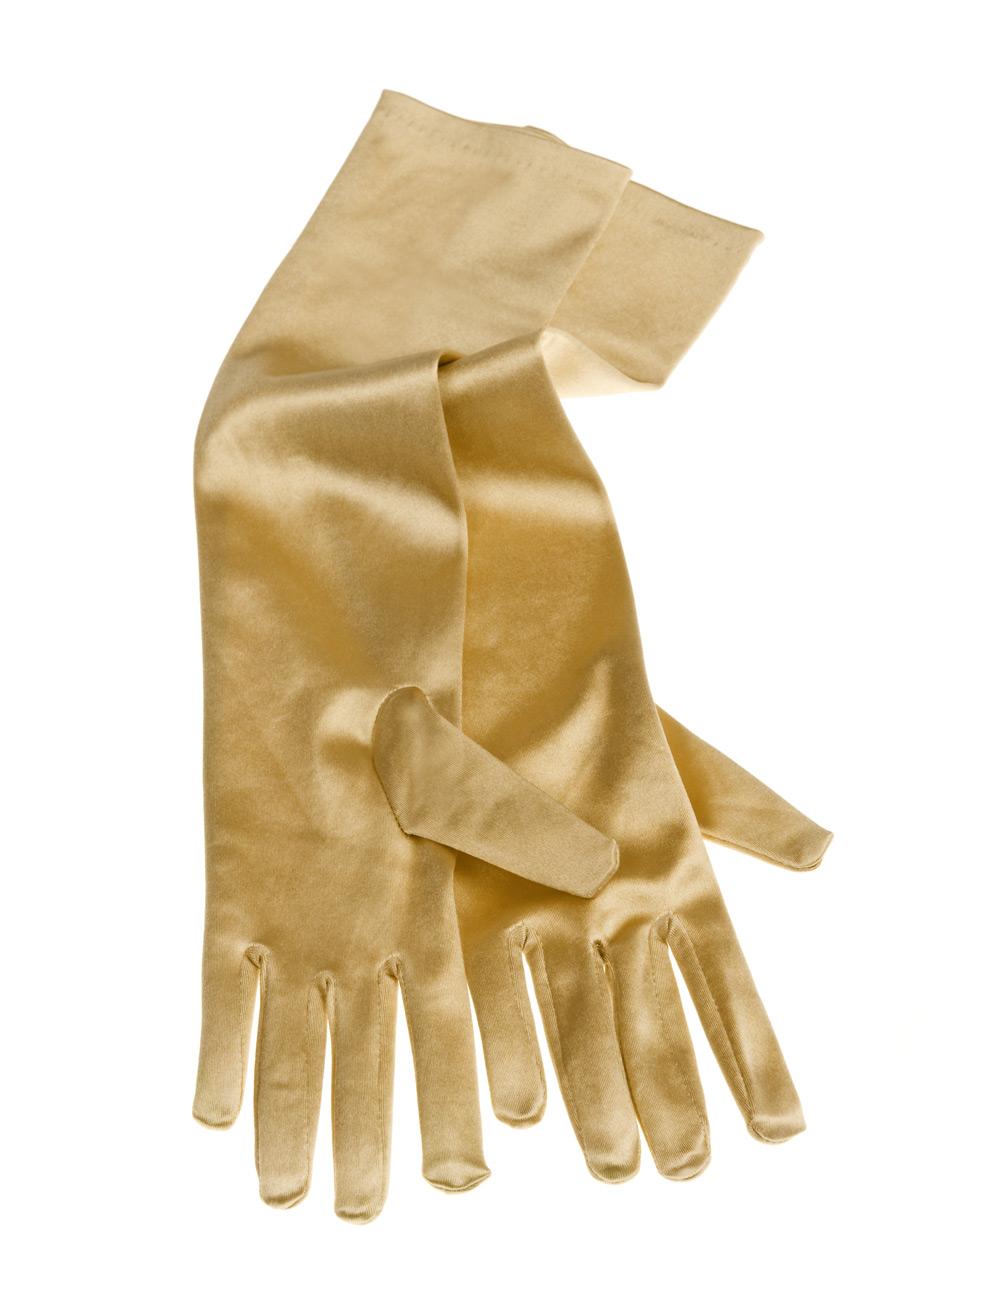 Kostuemzubehor Handschuhe Satin gold 40cm